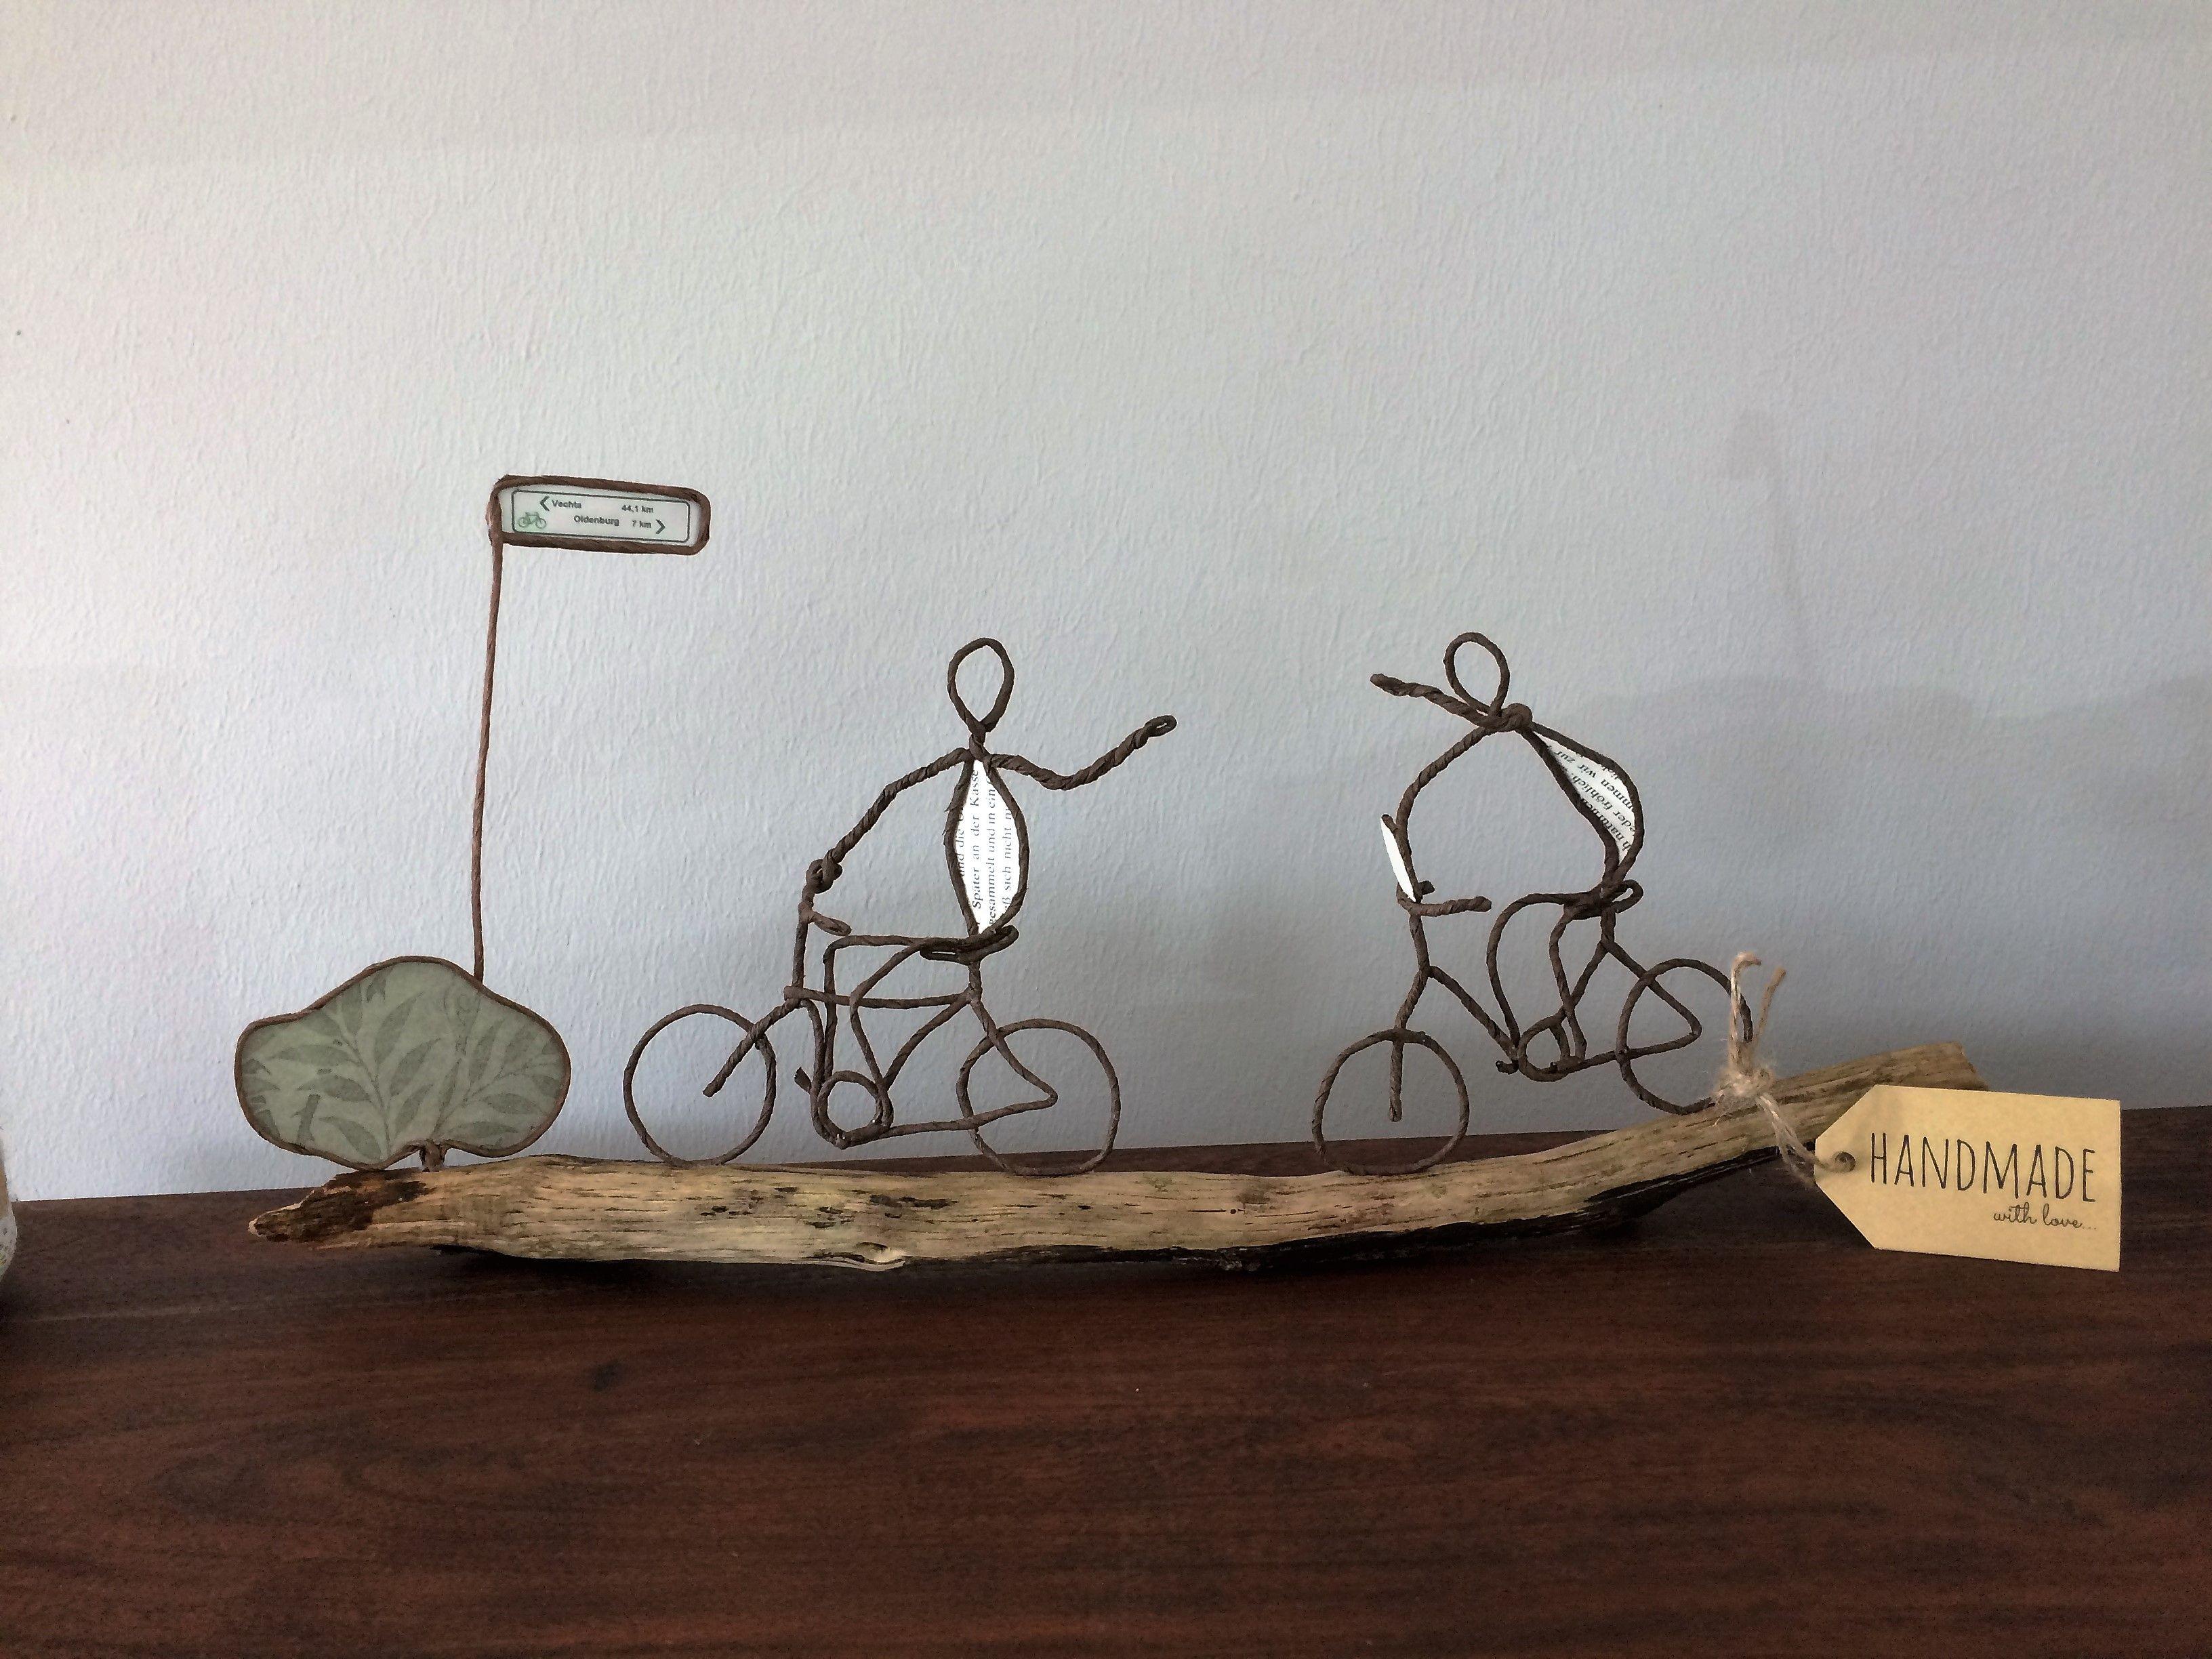 Radtour | Papierdraht Sculpturen by steffio123 | Pinterest ...